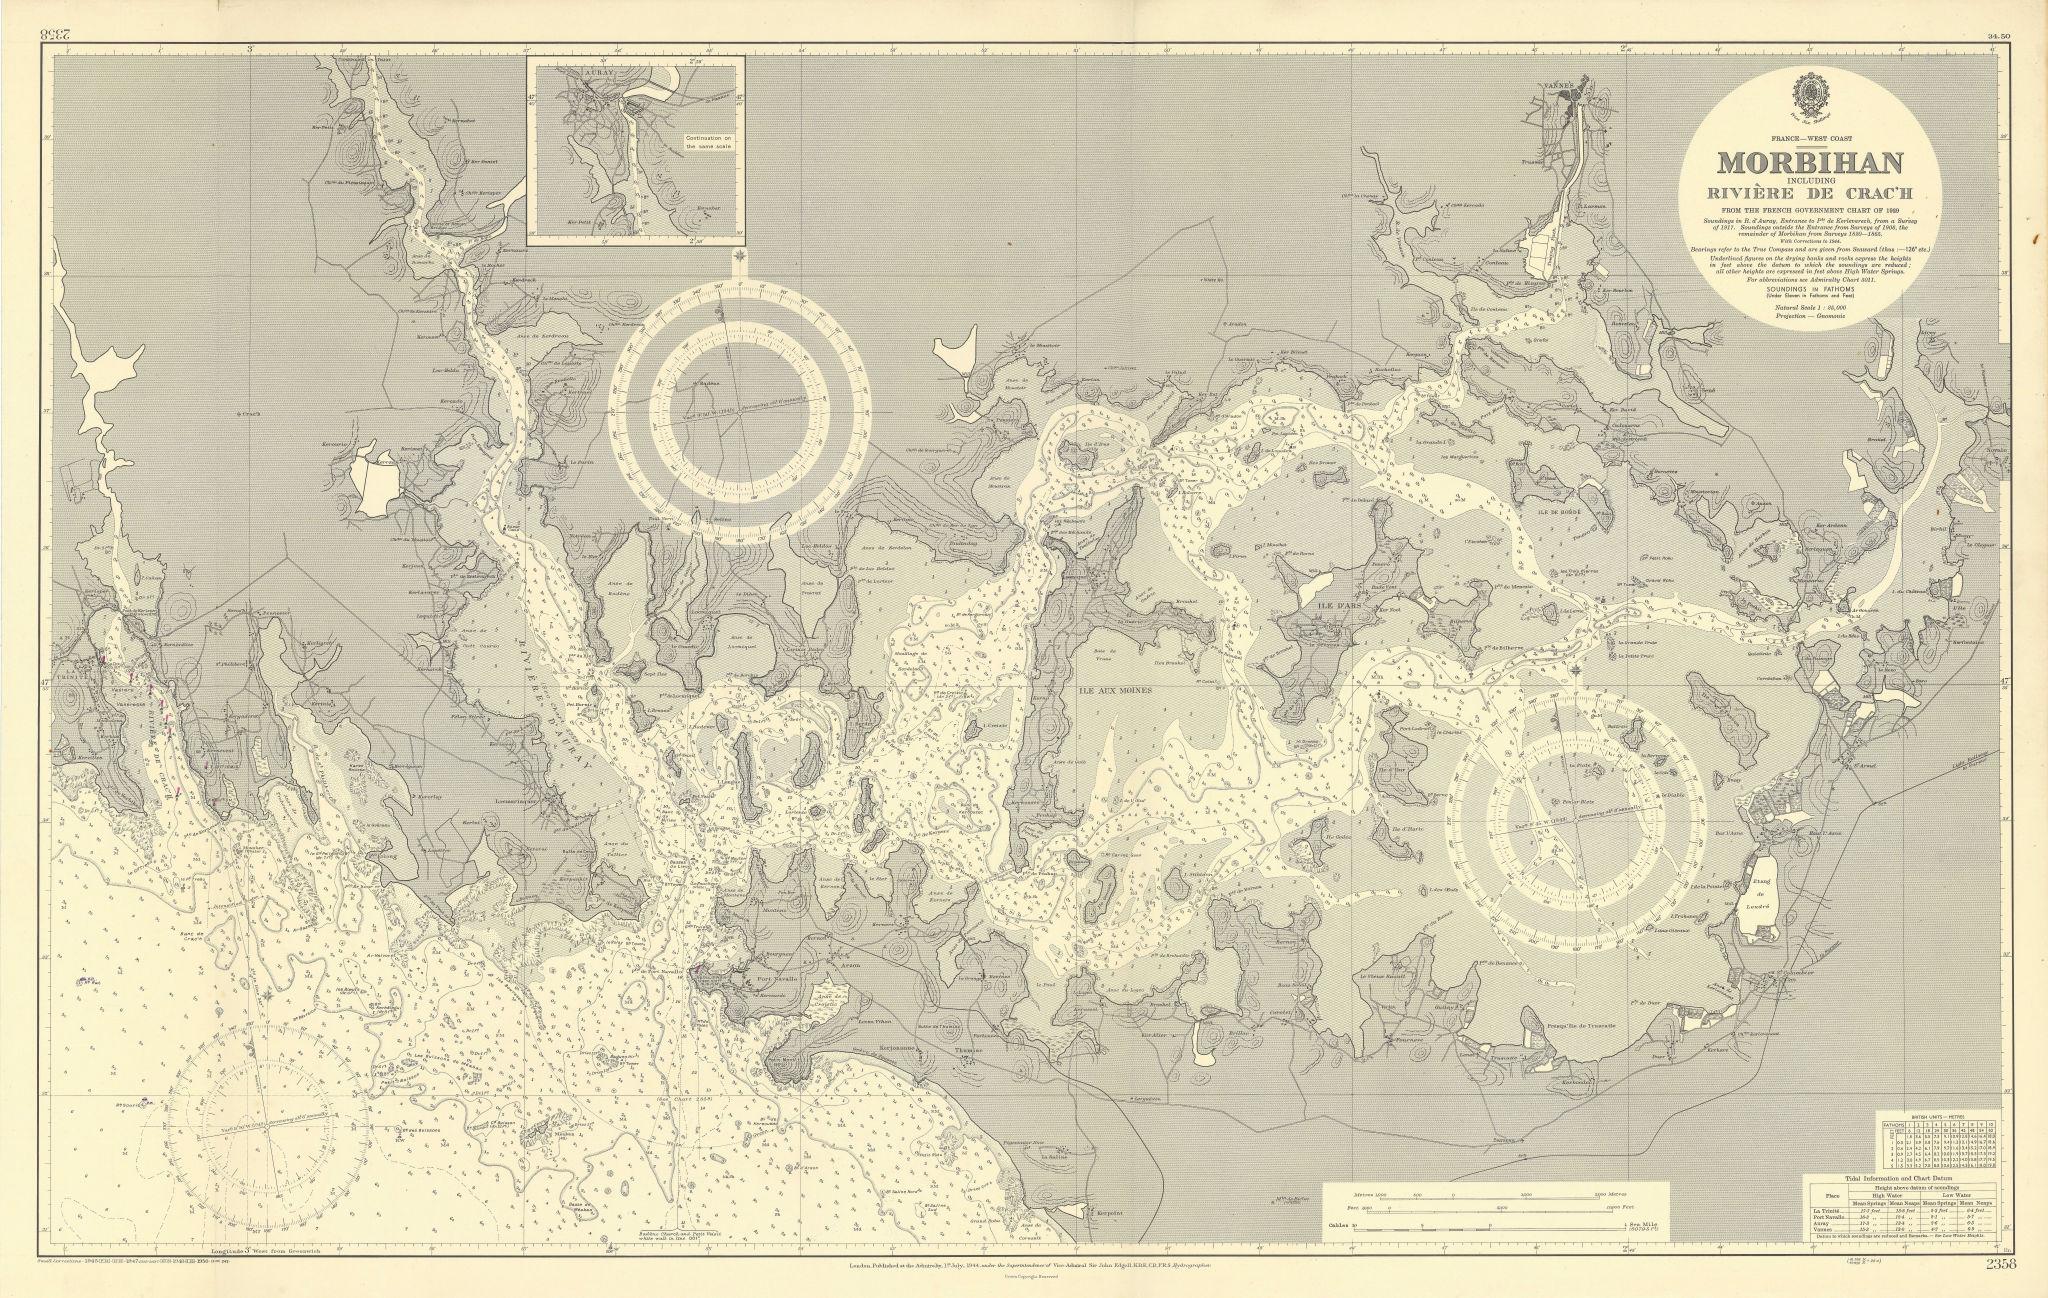 Gulf of Morbihan Rivière de Crac'h Vannes ADMIRALTY sea chart 1944 (1950) map